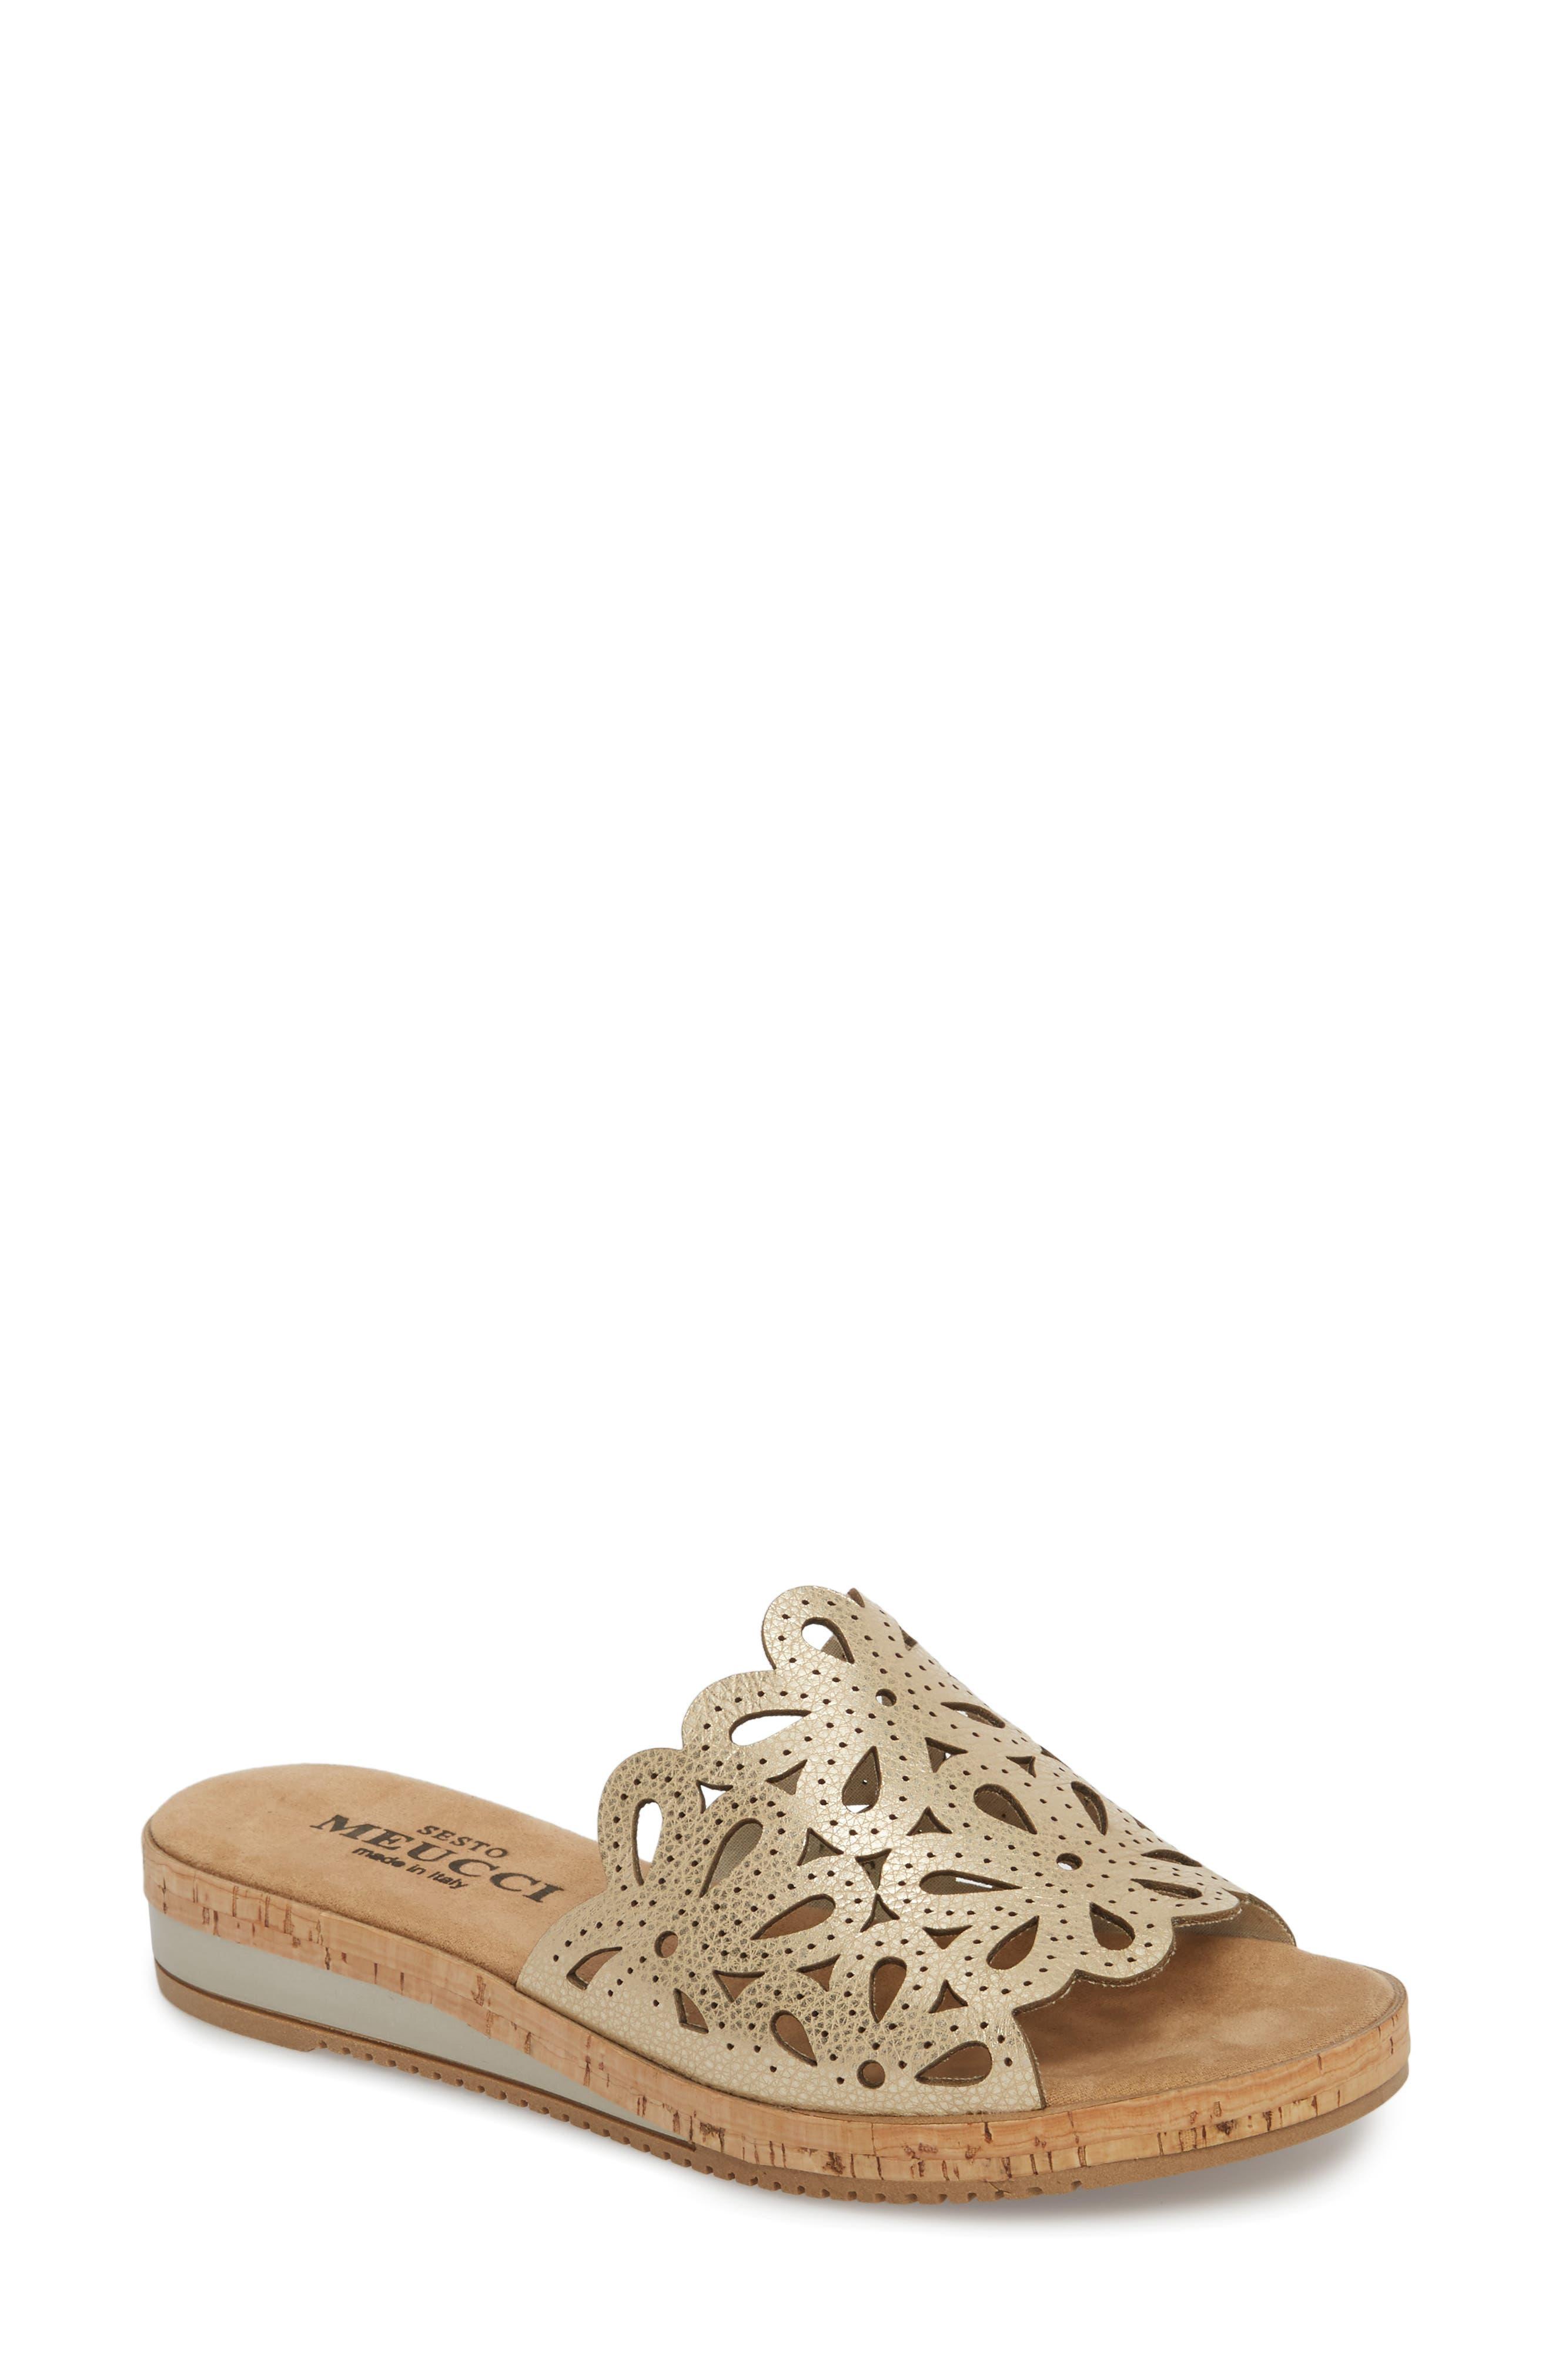 Selina Slide Sandal,                         Main,                         color, Platino Leather